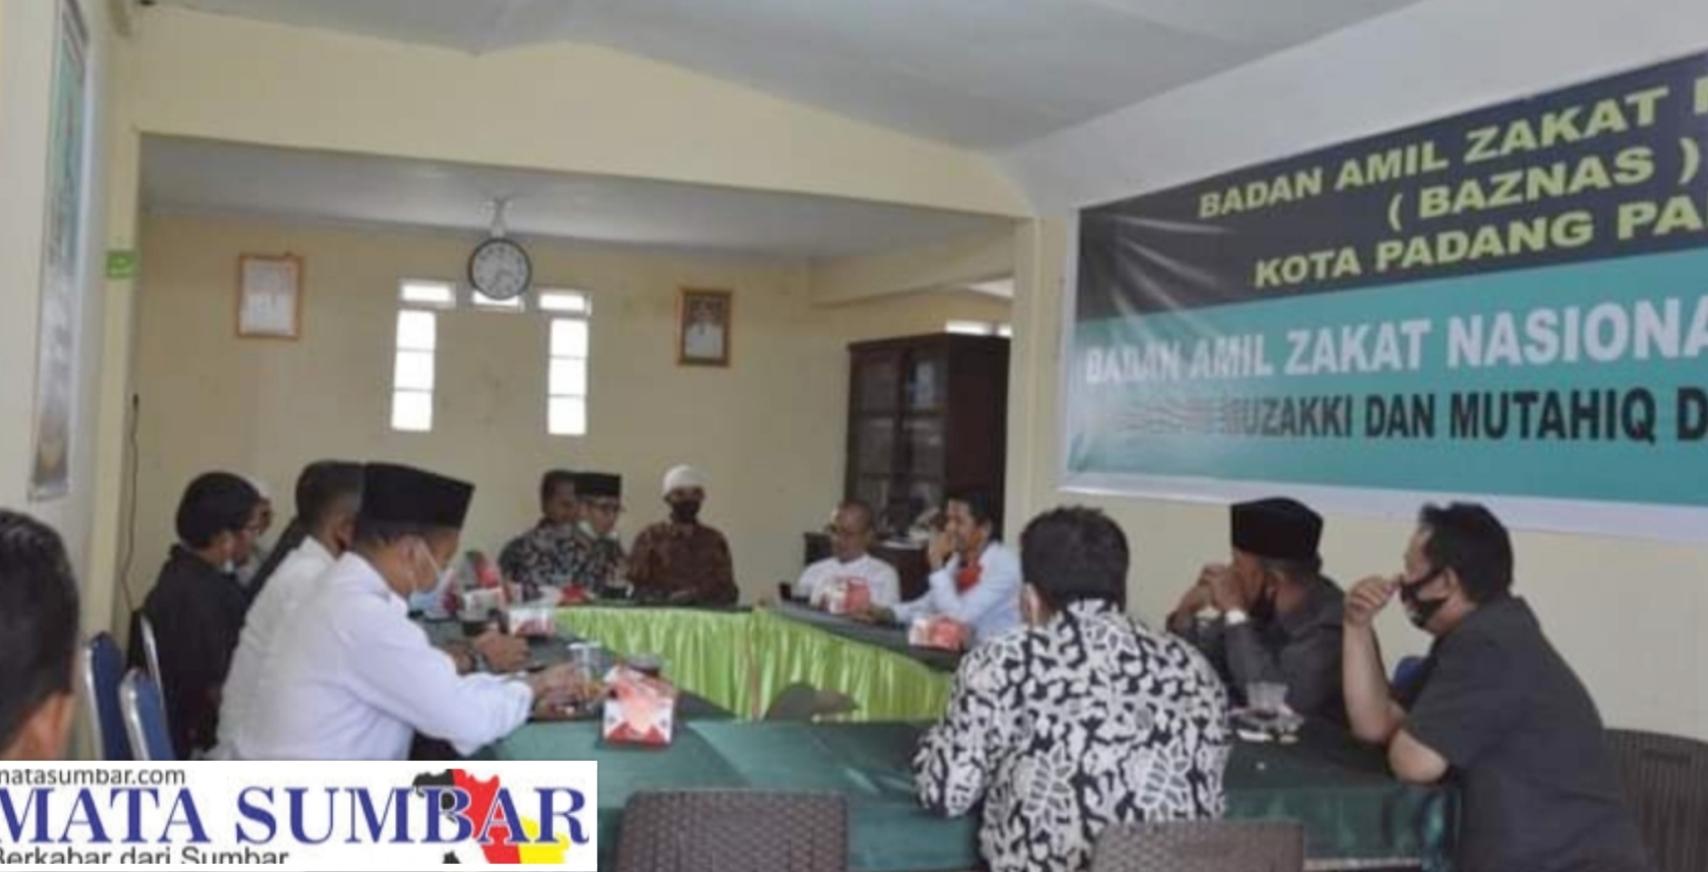 Bapemperda DPRD Agam Belajar Pengelolaan Zakat ke Baznaz Kota Padang Panjang